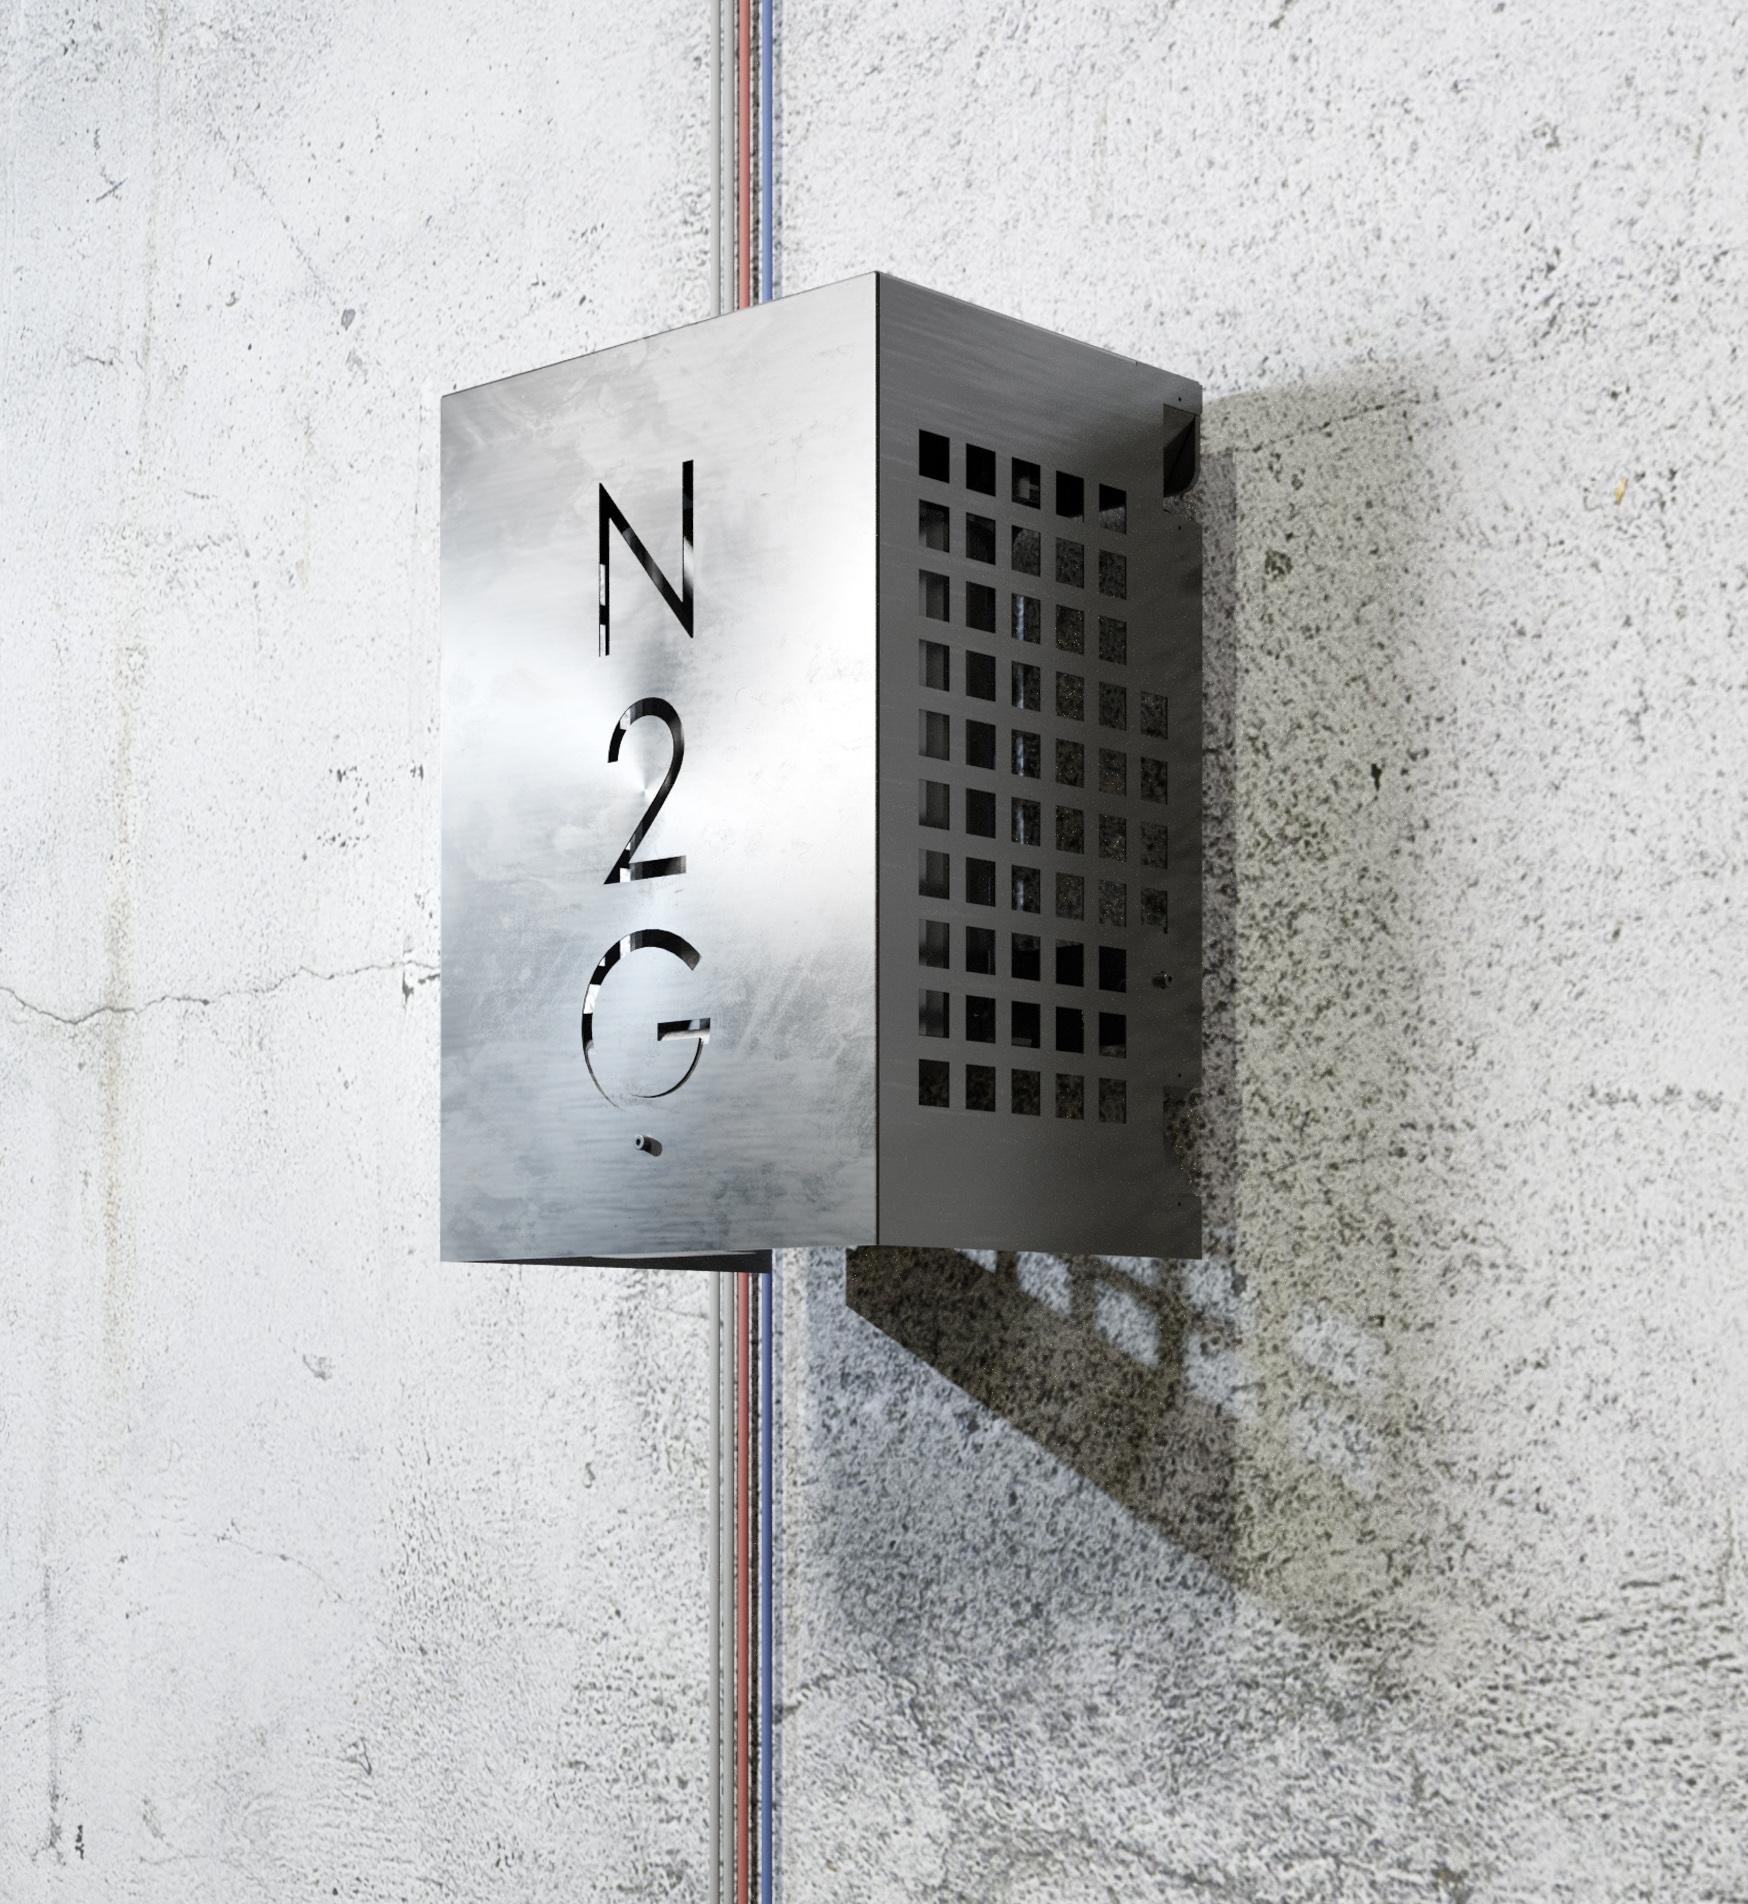 N2G Generator